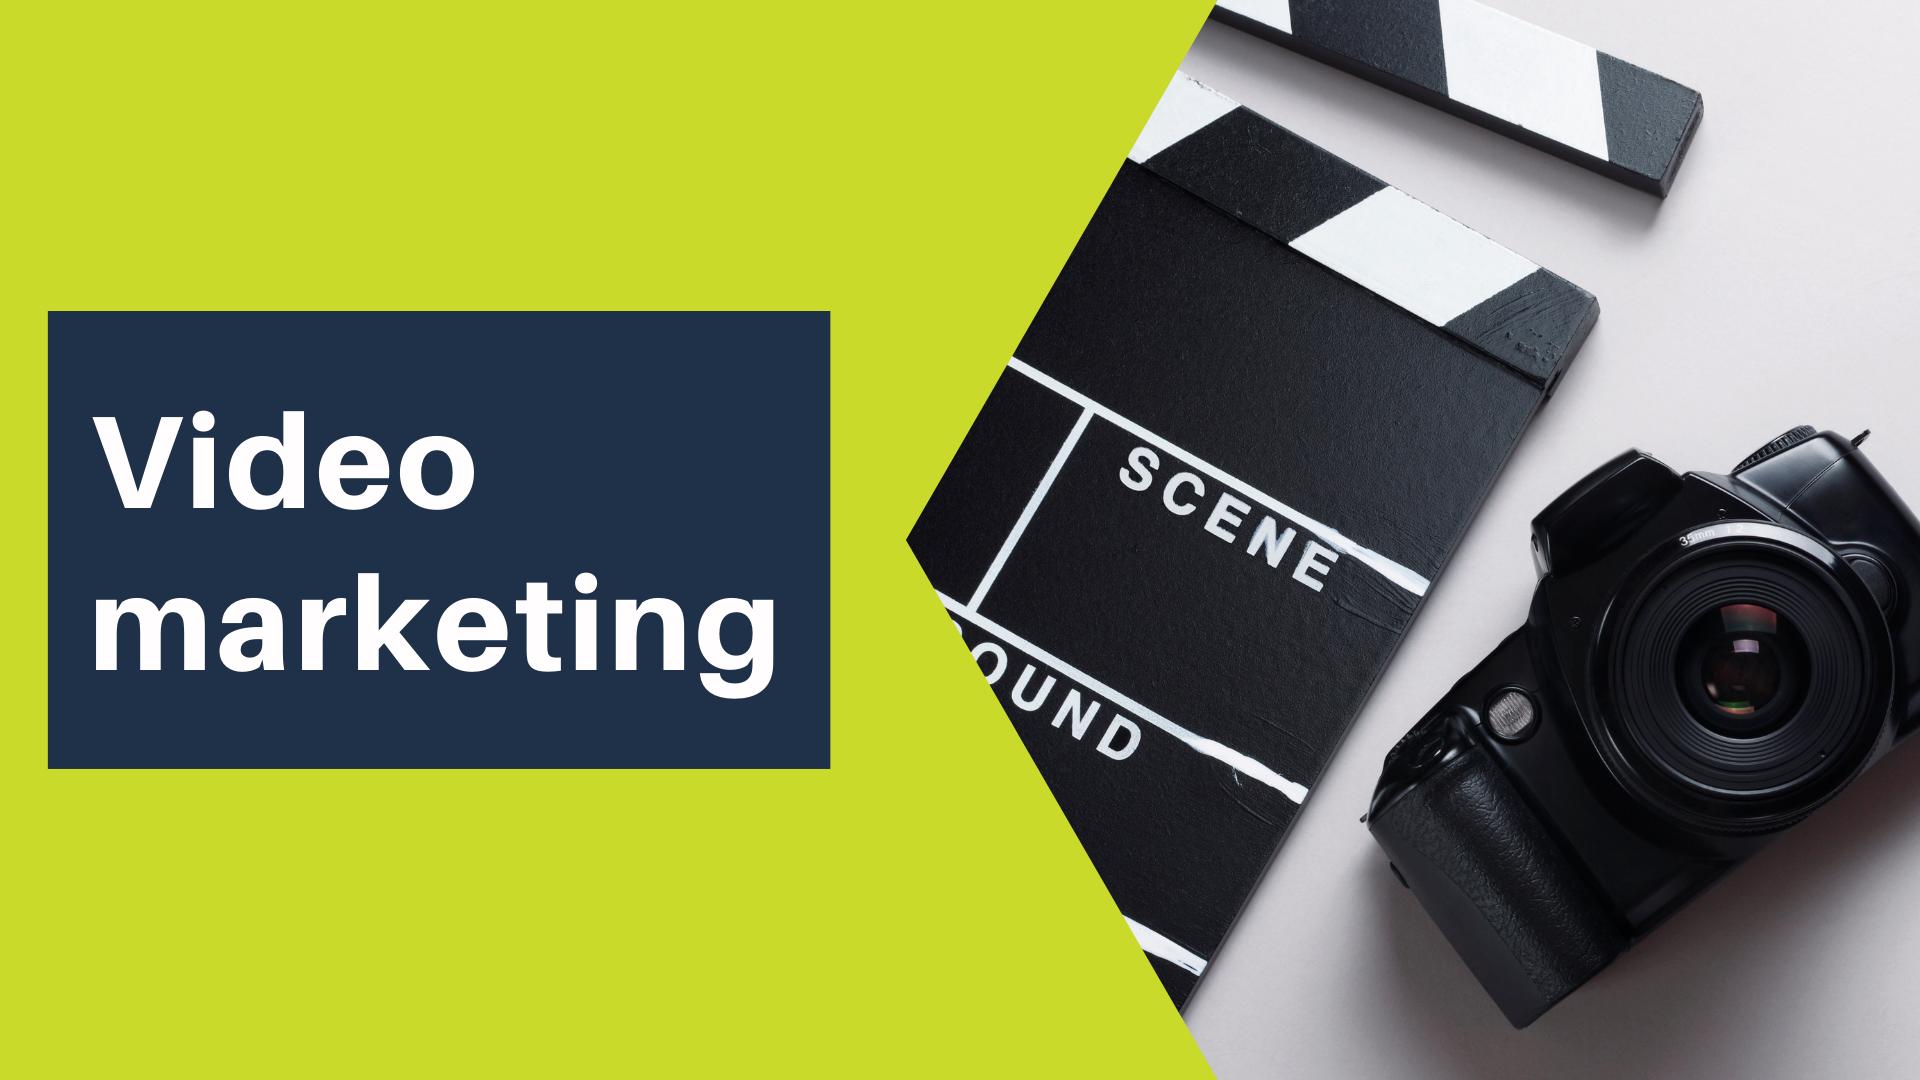 Dental video marketing